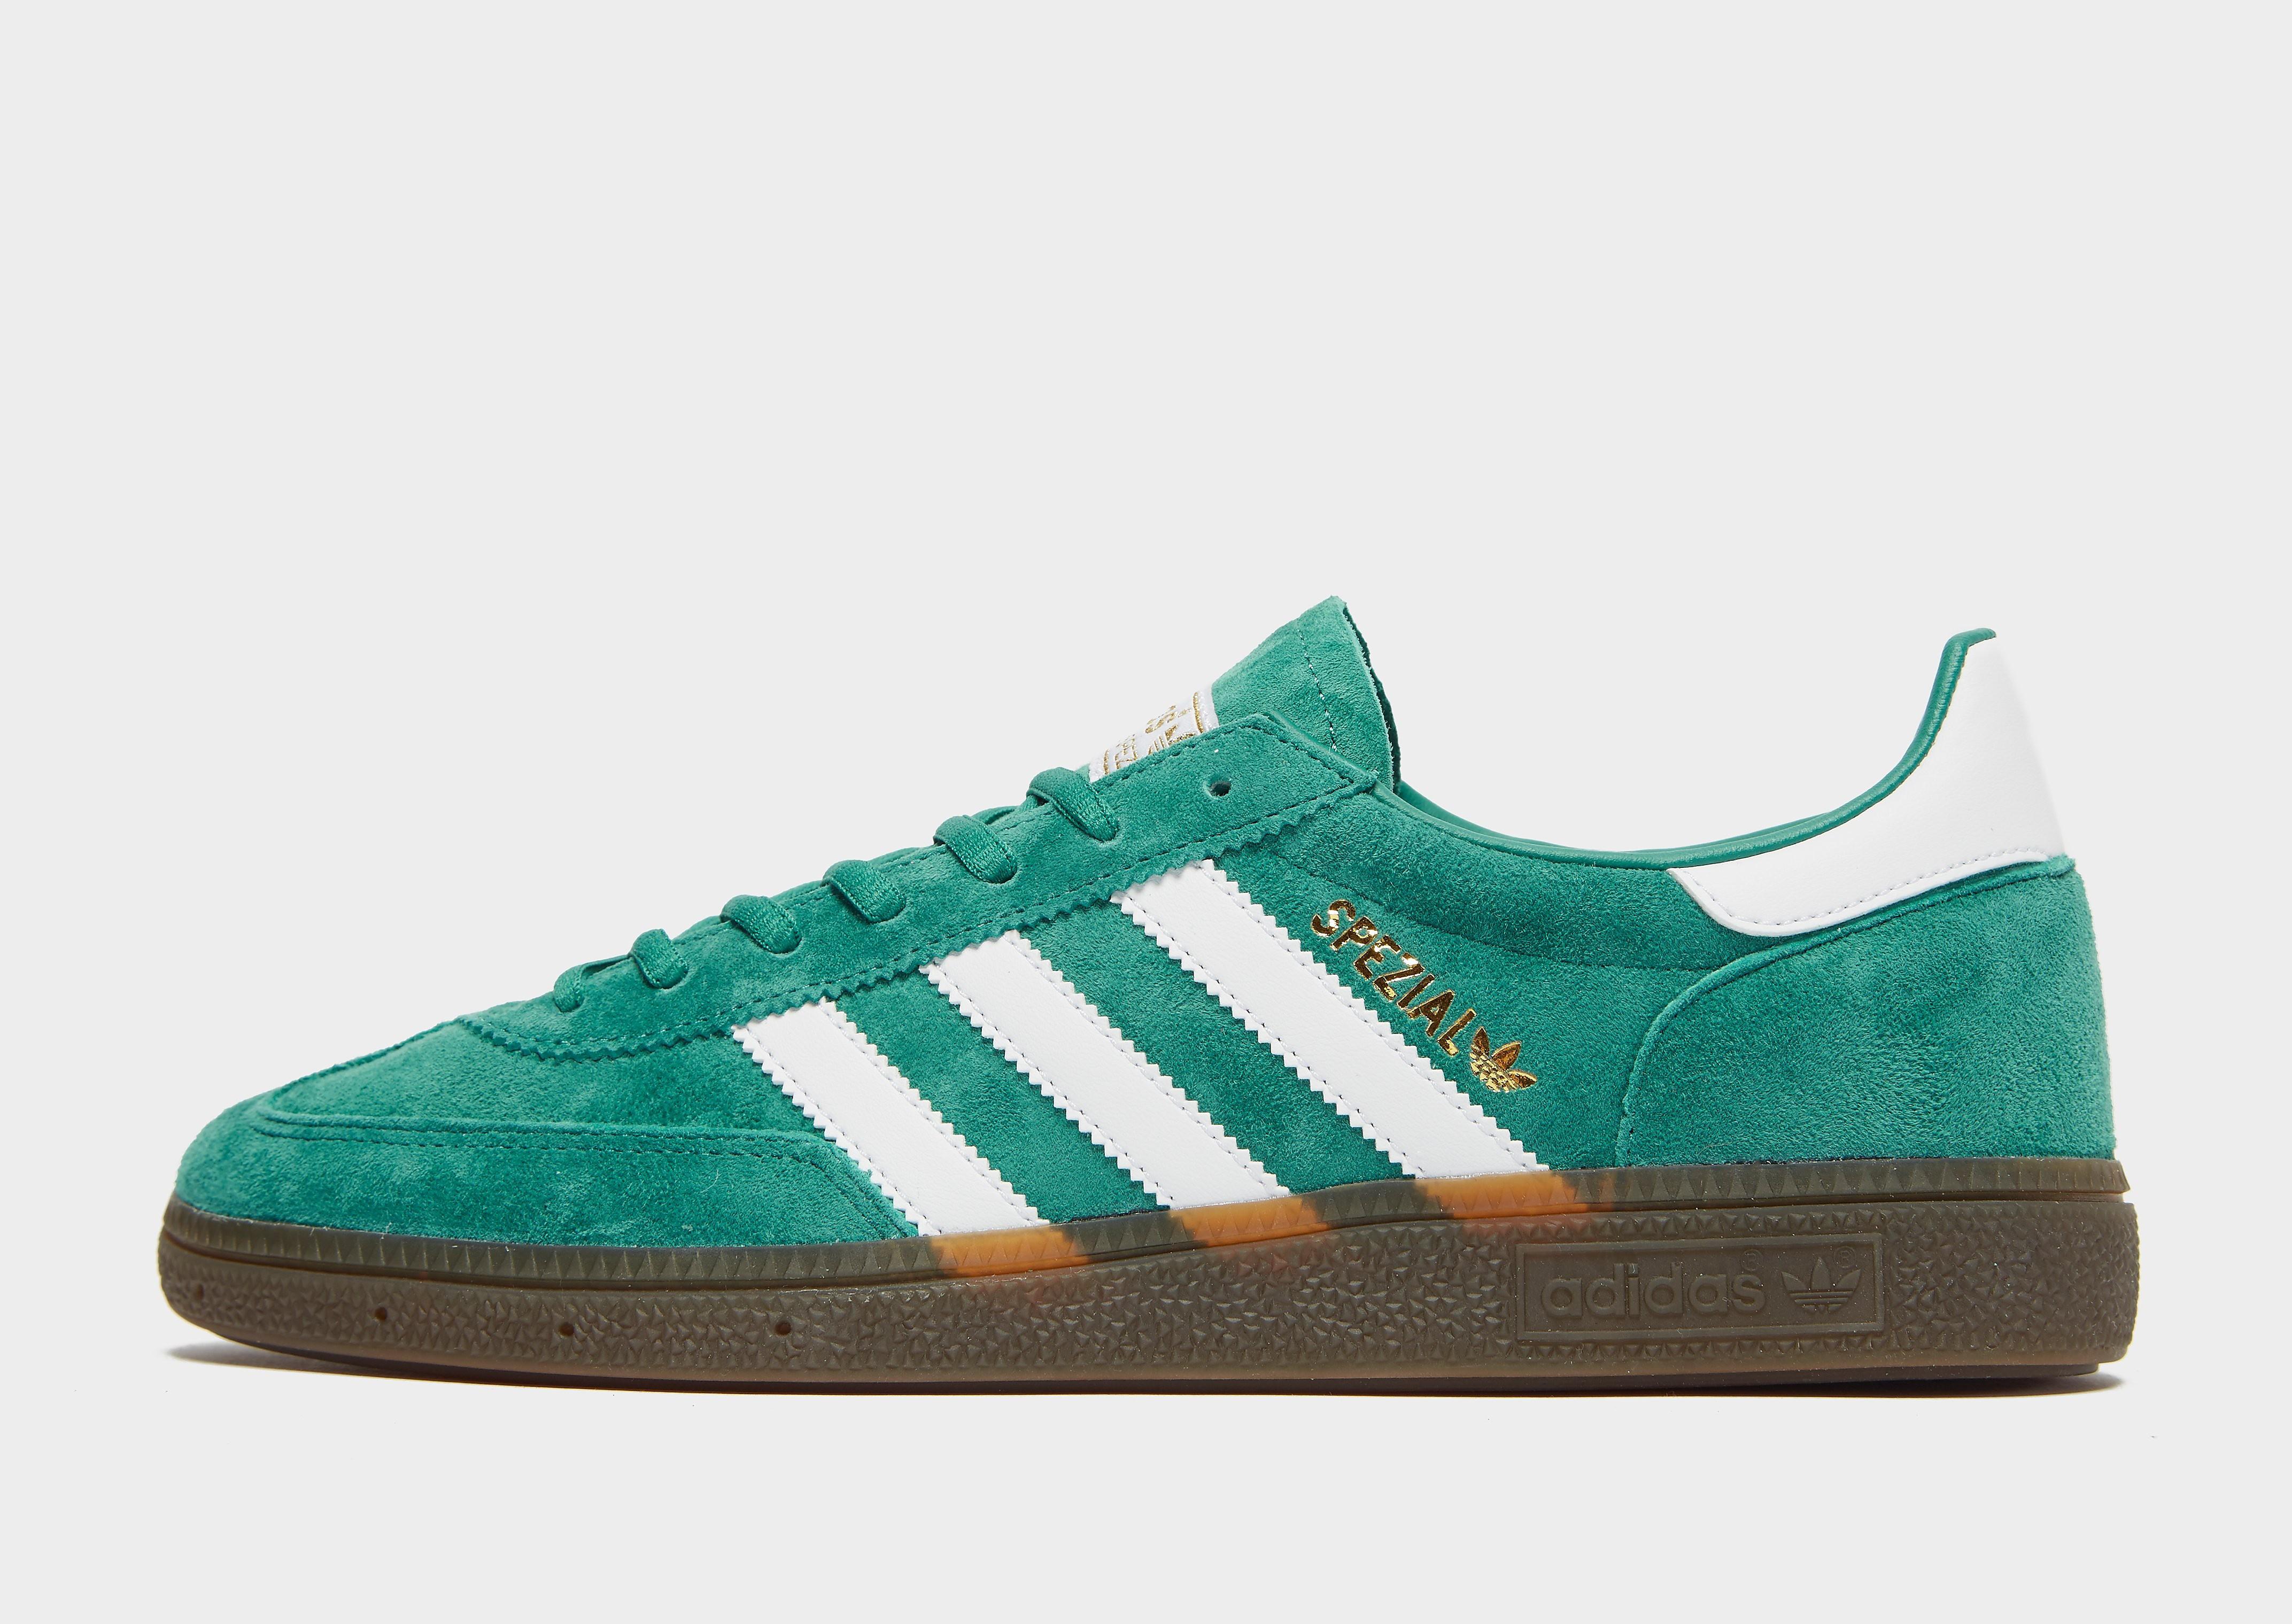 adidas Originals Handball Spezial - Groen - Heren